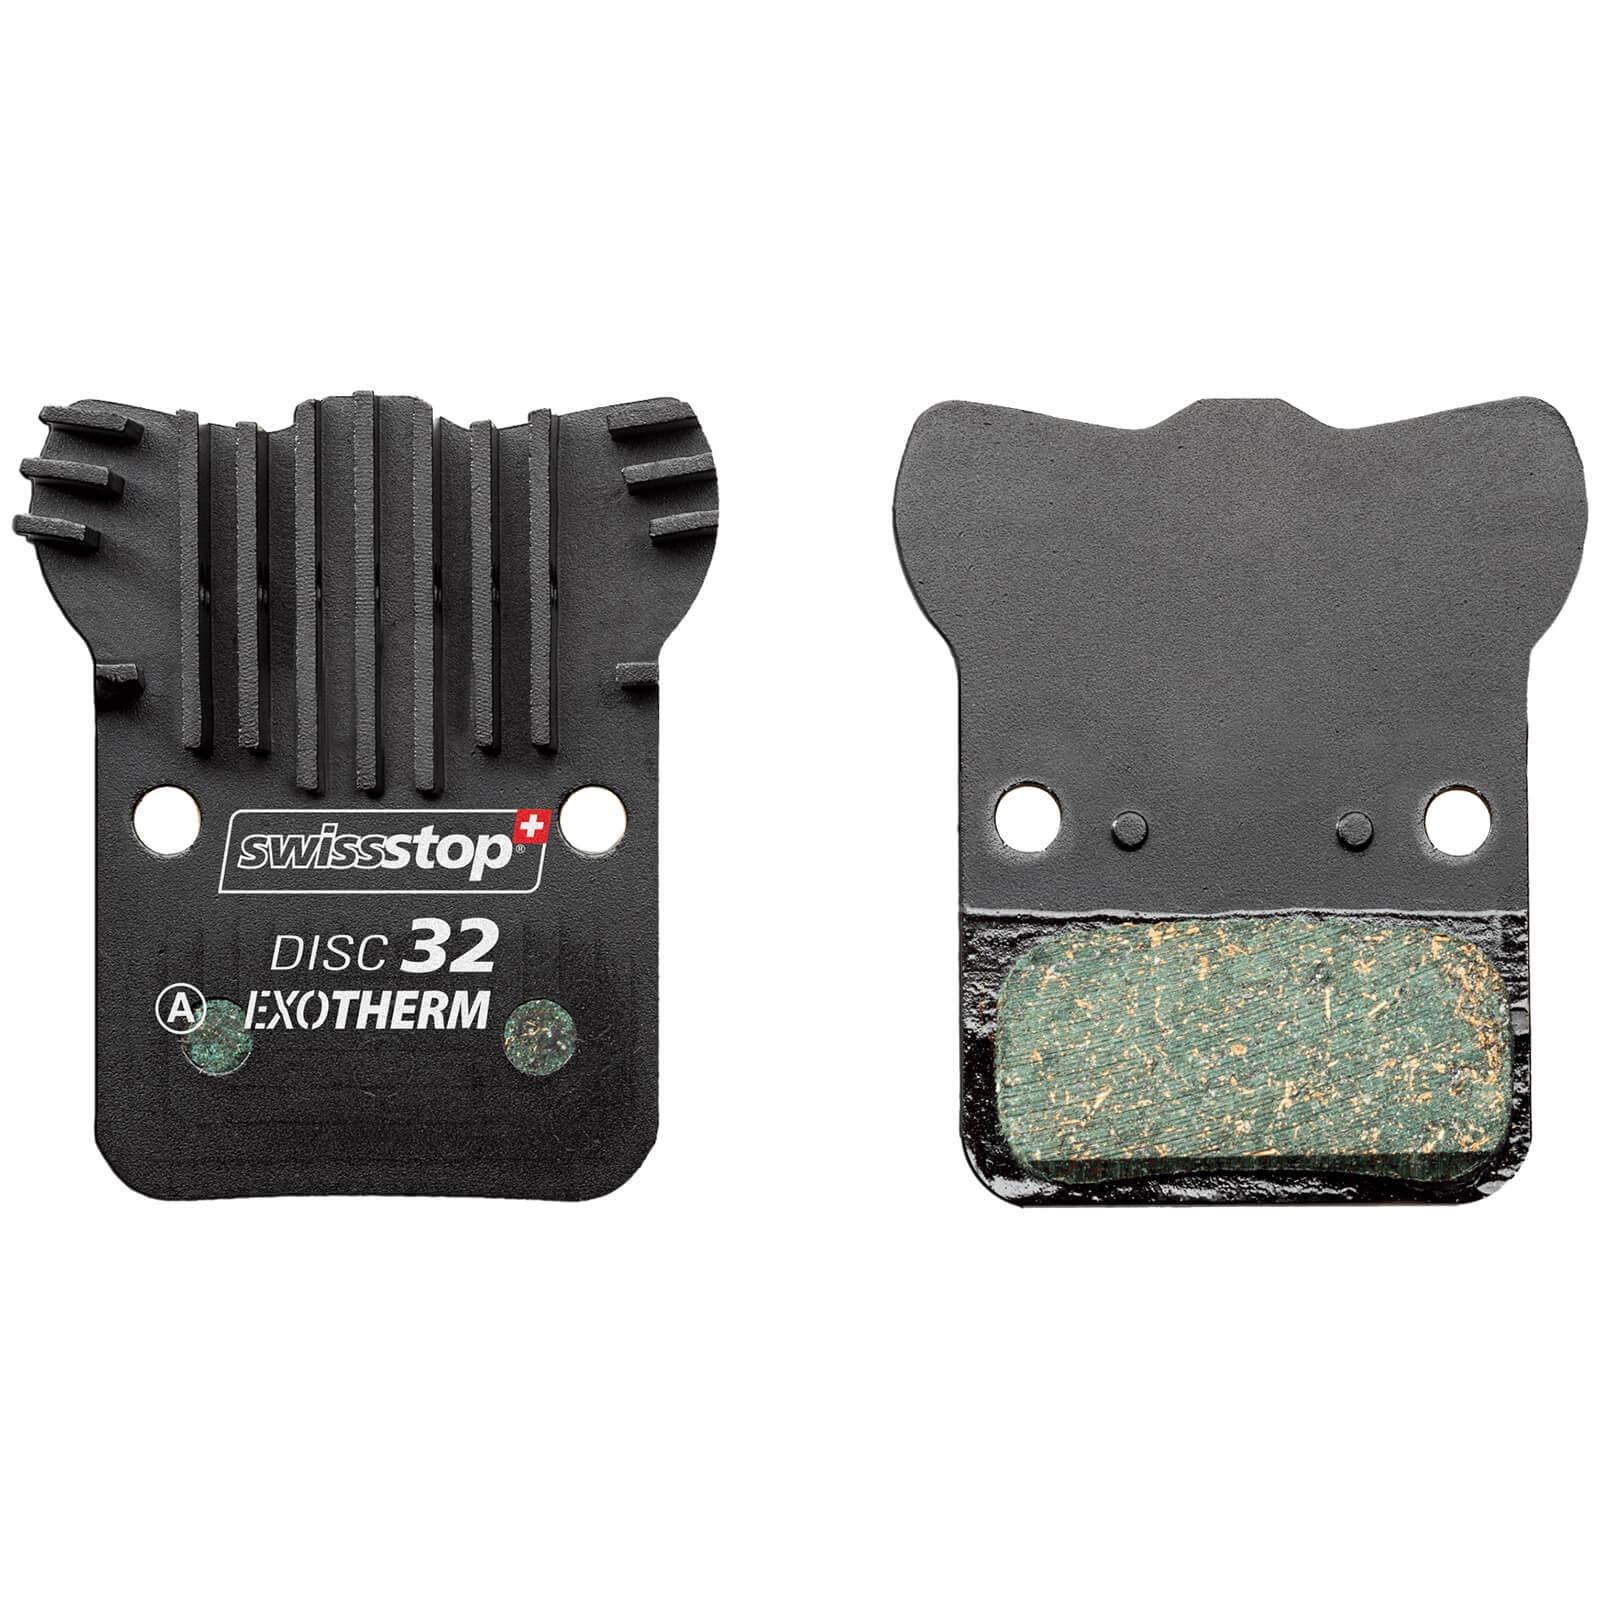 SwissStop ExoTherm 2 Disc Brake Pads - Disc 32